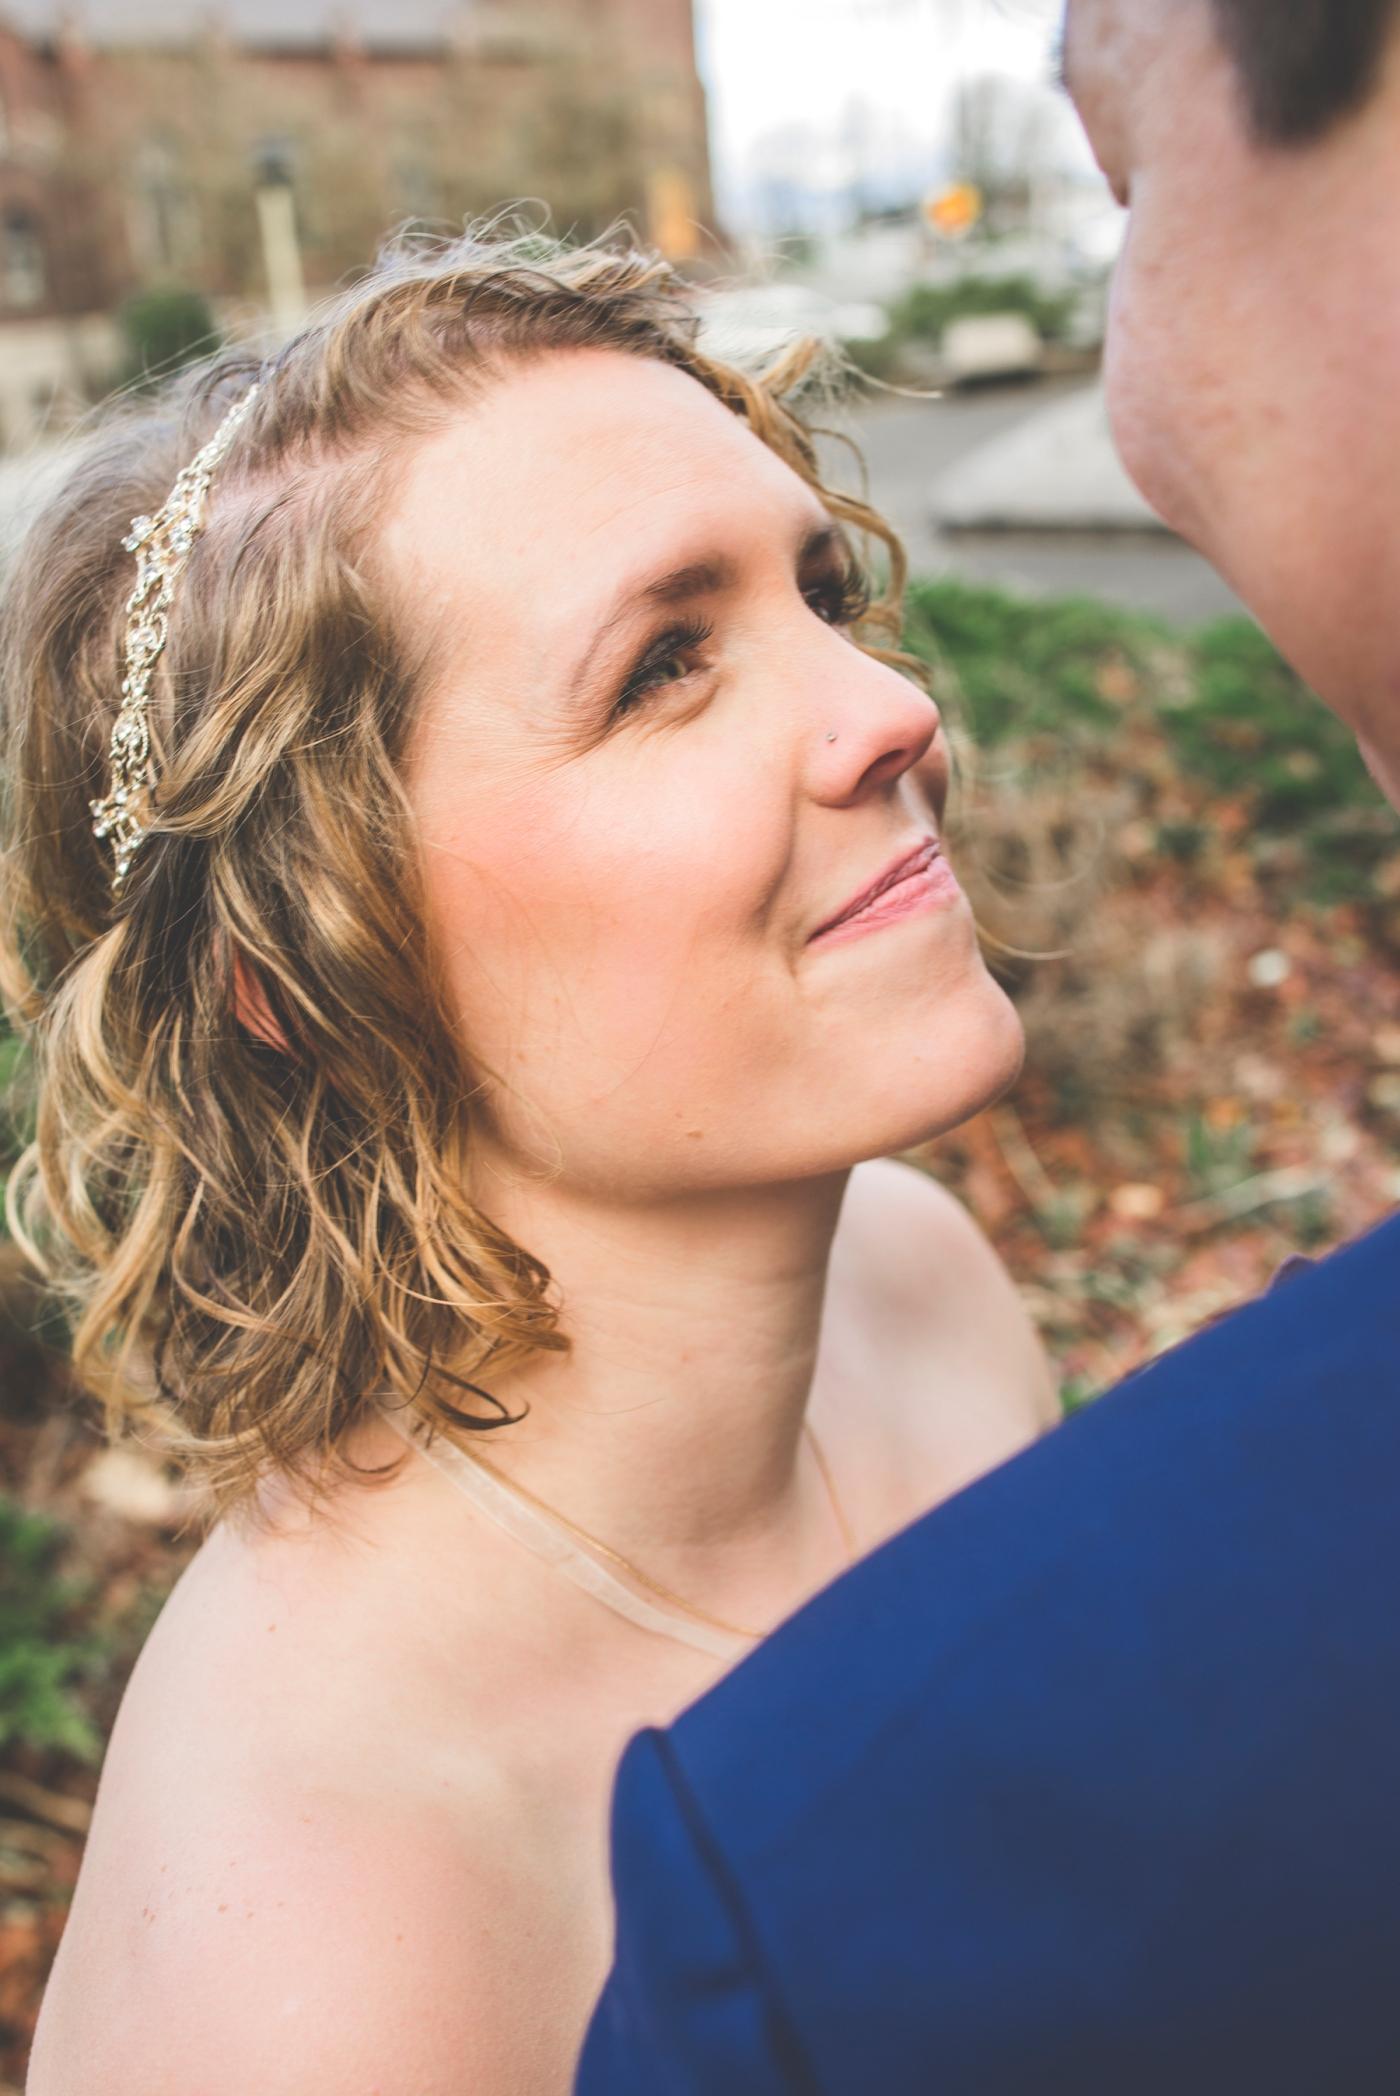 DSC_2351Everett_Wedding_Ballroom_Jane_Speleers_photography_Rachel_and_Edmund_Bridesmaids_peach_dresses_groomsmen_2017